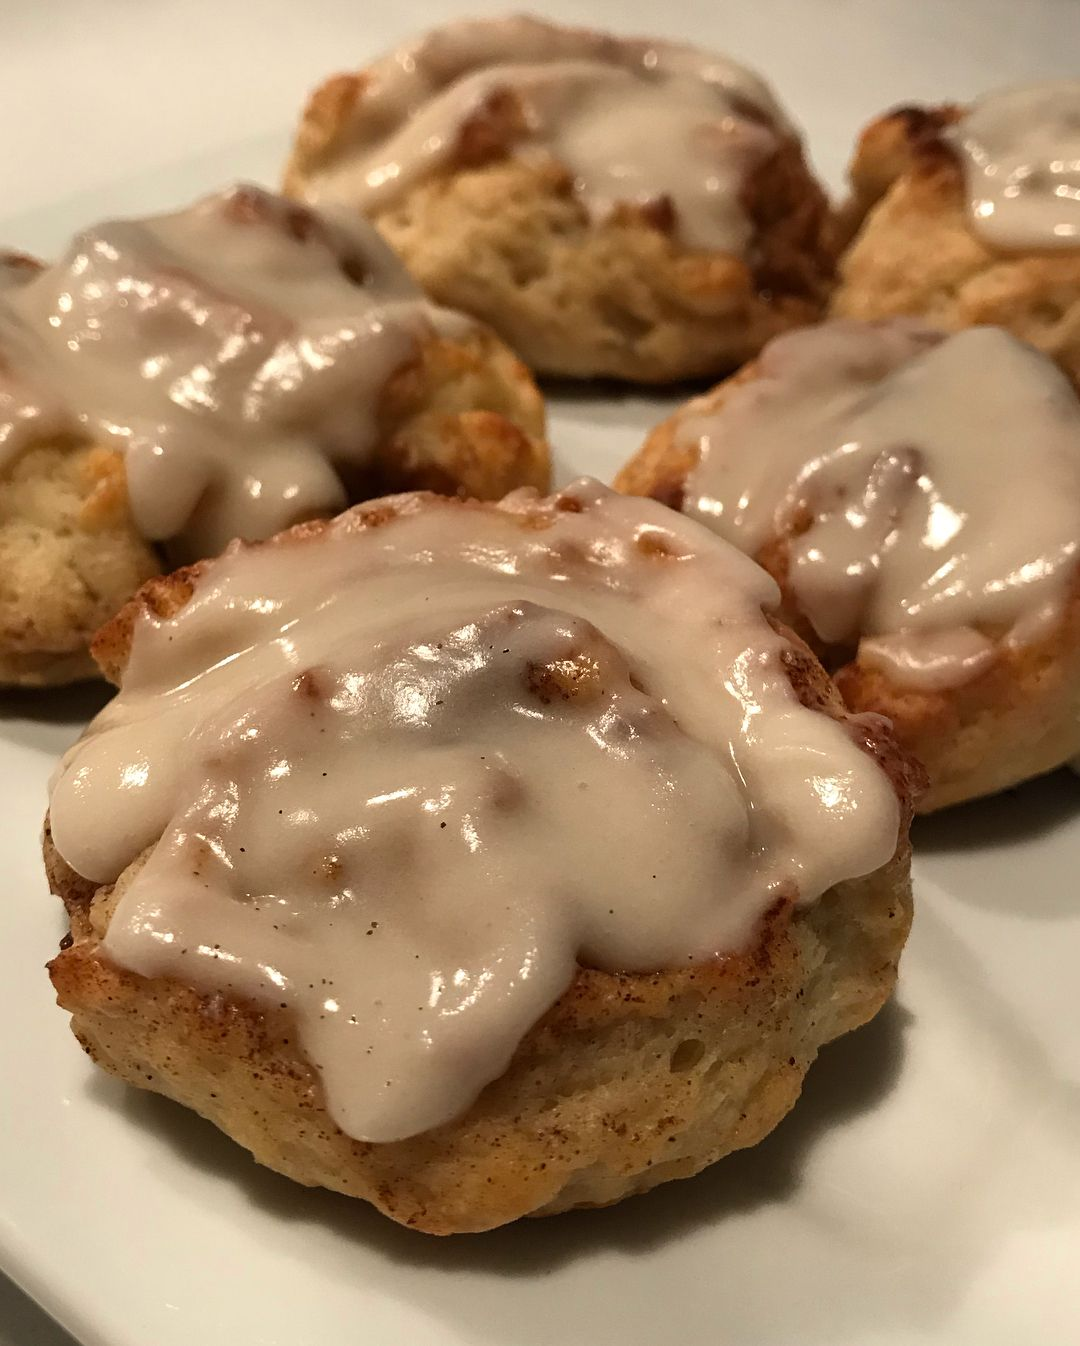 cinnamon rolls 1 c fat free Greek yogurt. 1 c self rising